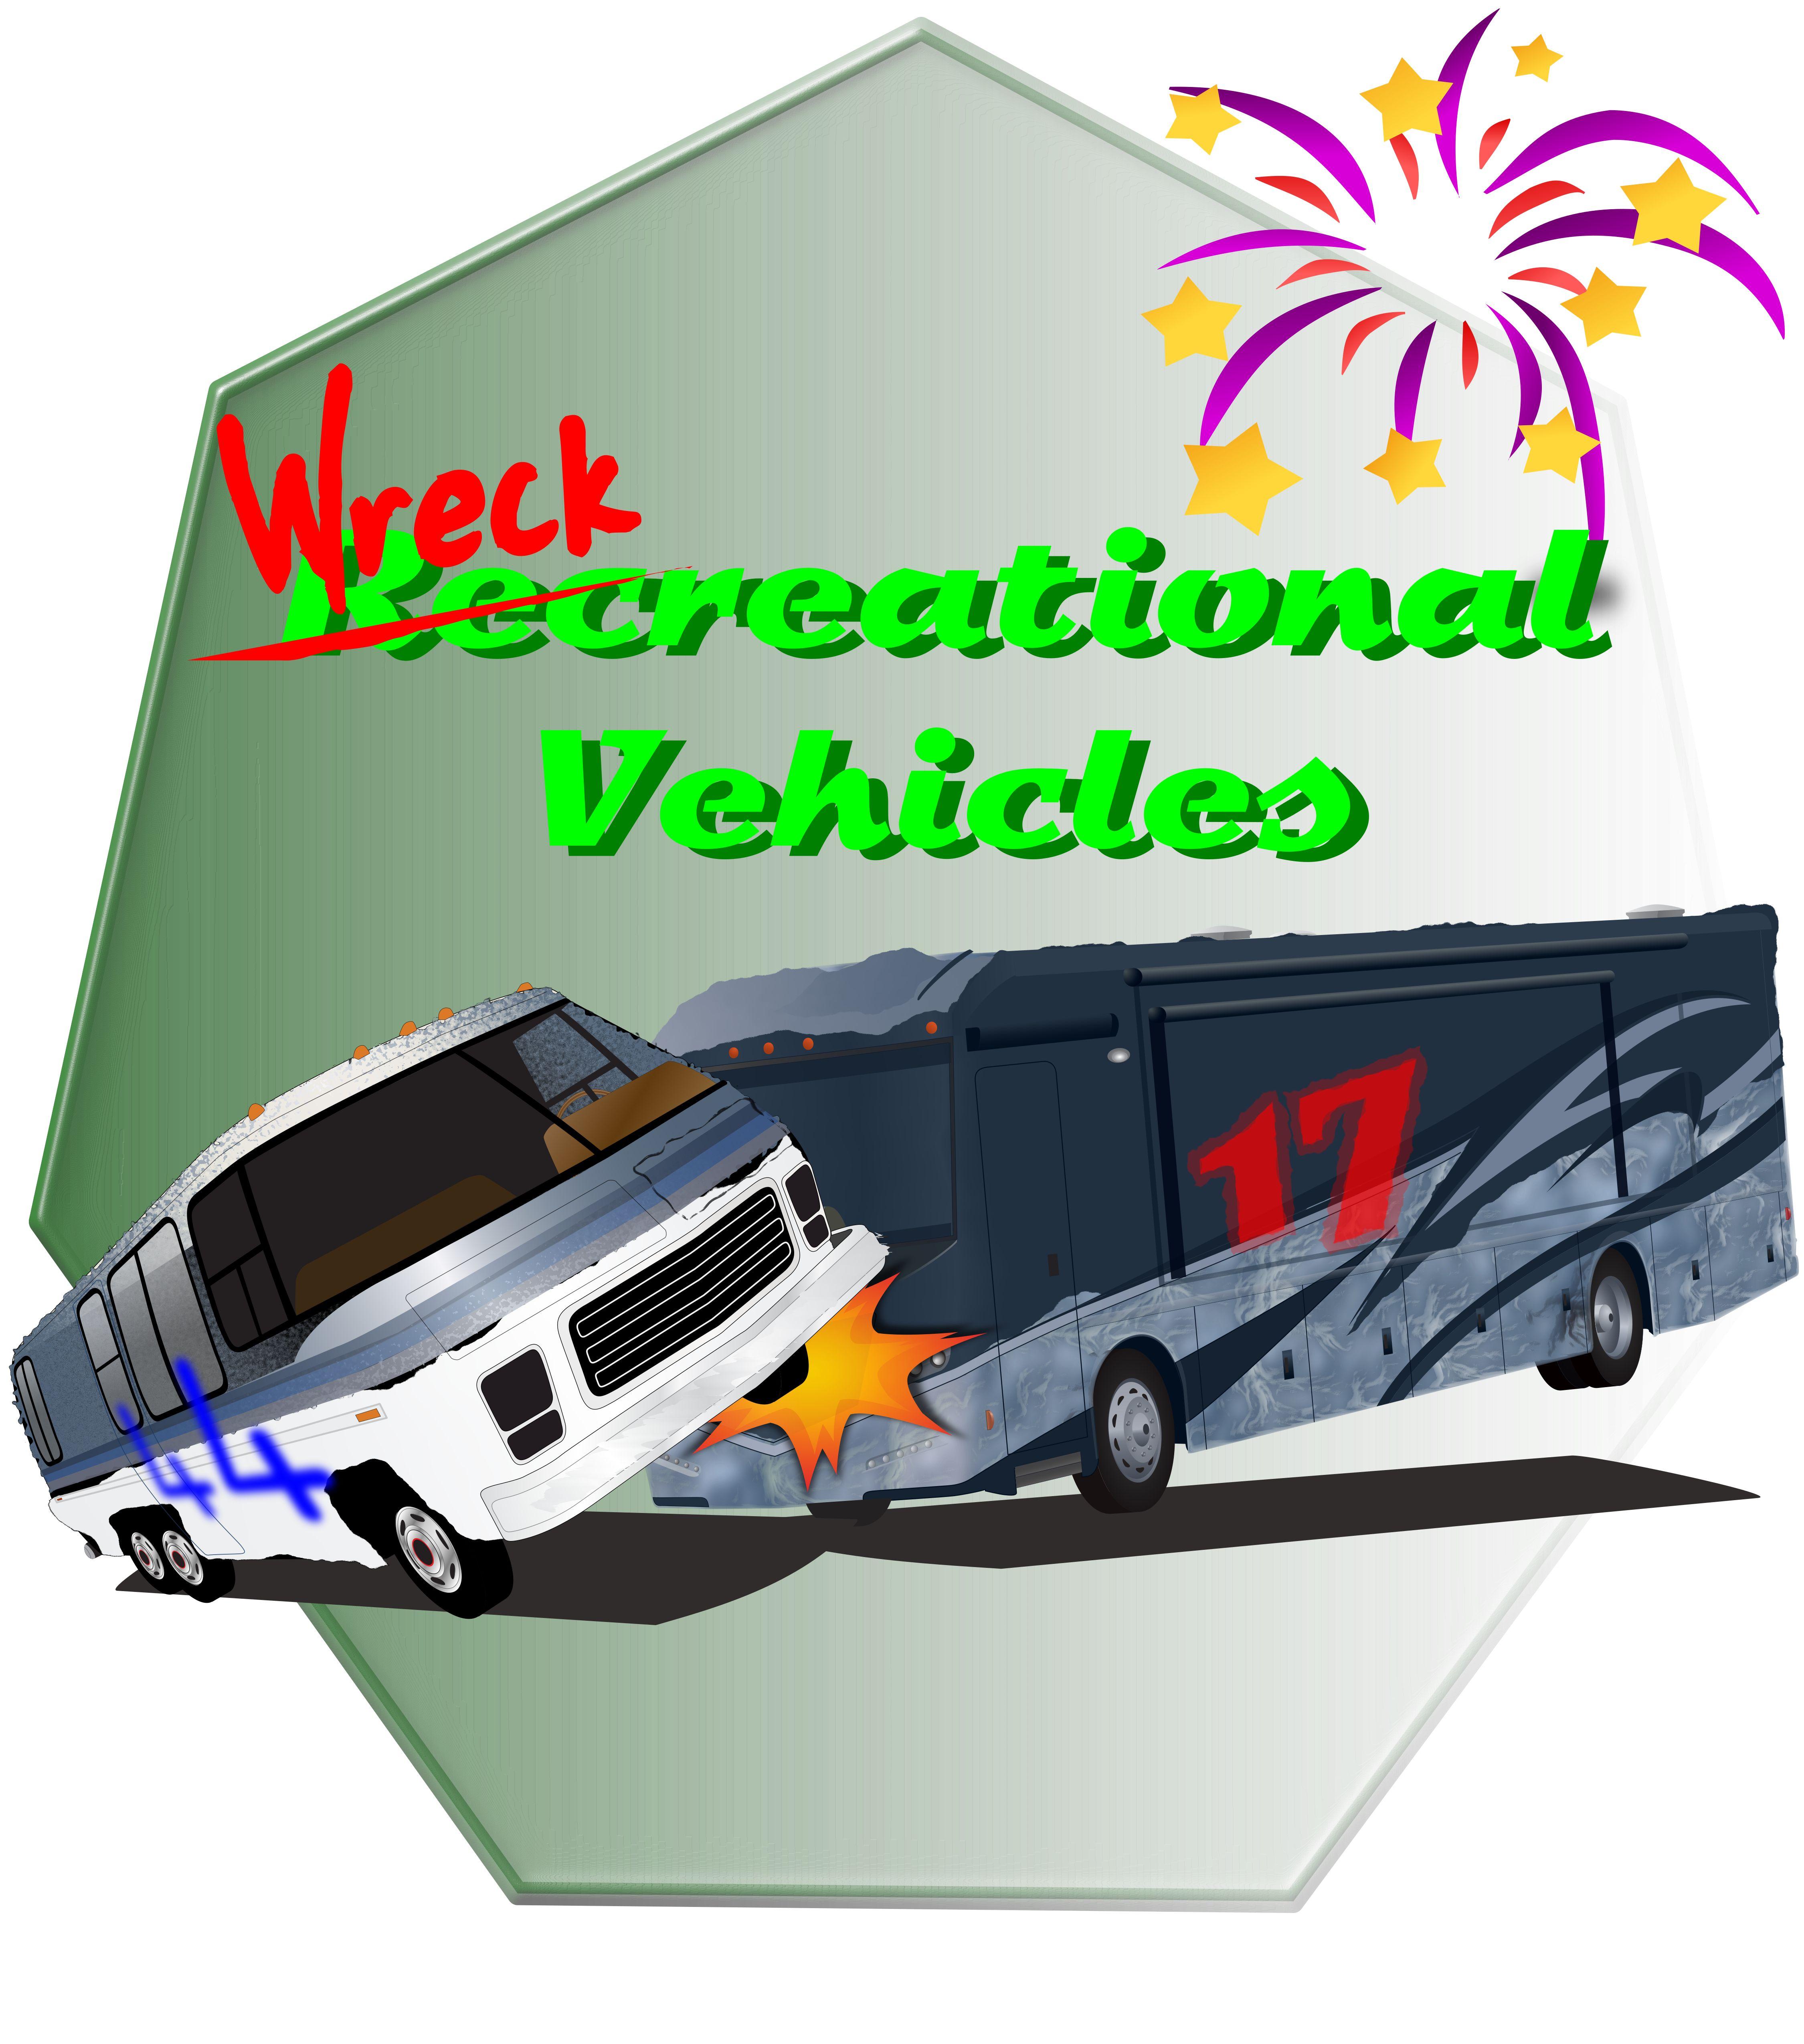 wreckreational-vehicles-300dpi